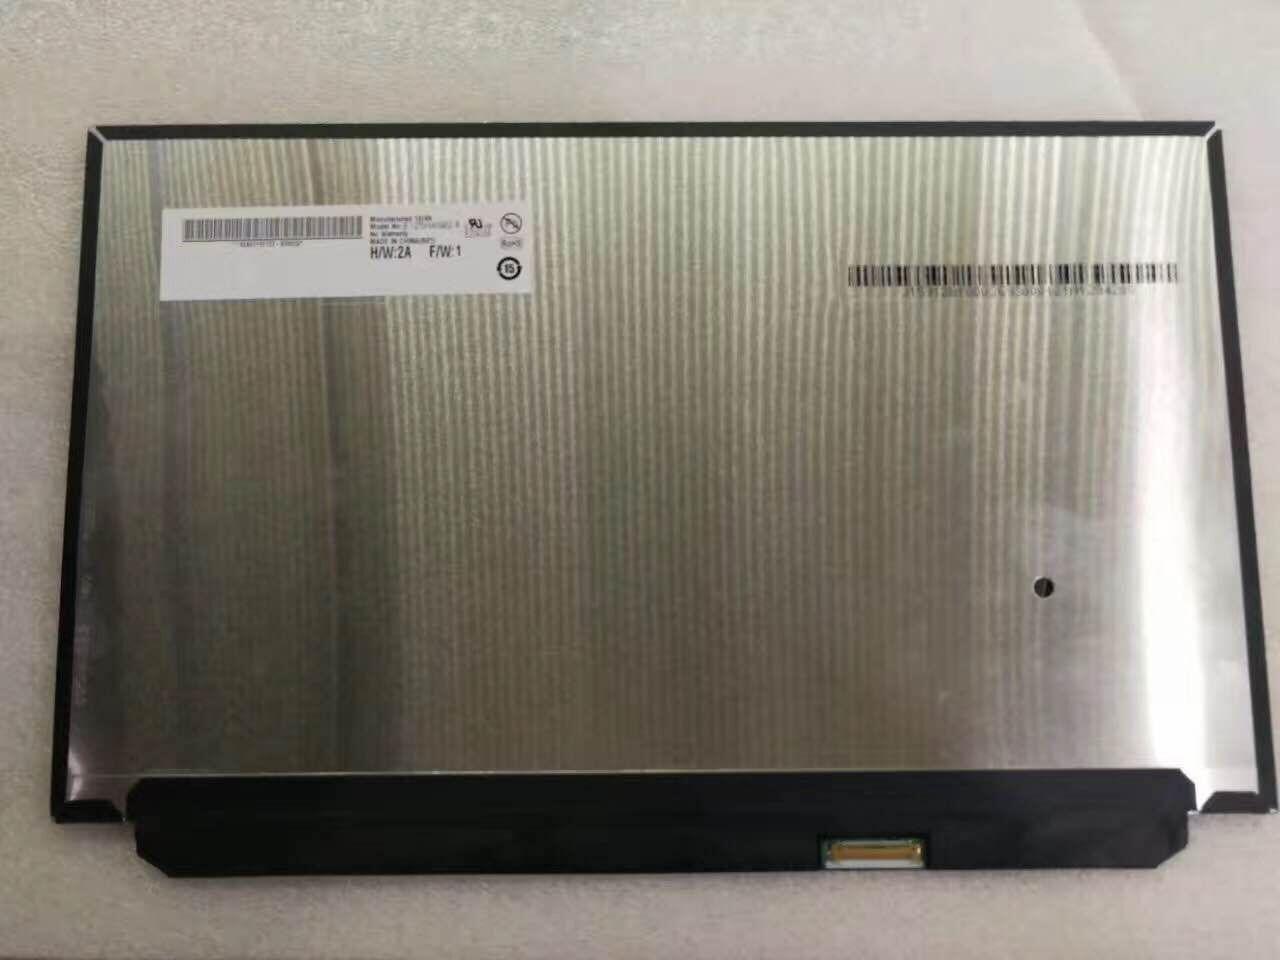 12.5 ''LED LCD Écran IPS 16.7 M Pour Lenovo ThinkPad X240 X250 FHD IPS 00HM111 00HN899